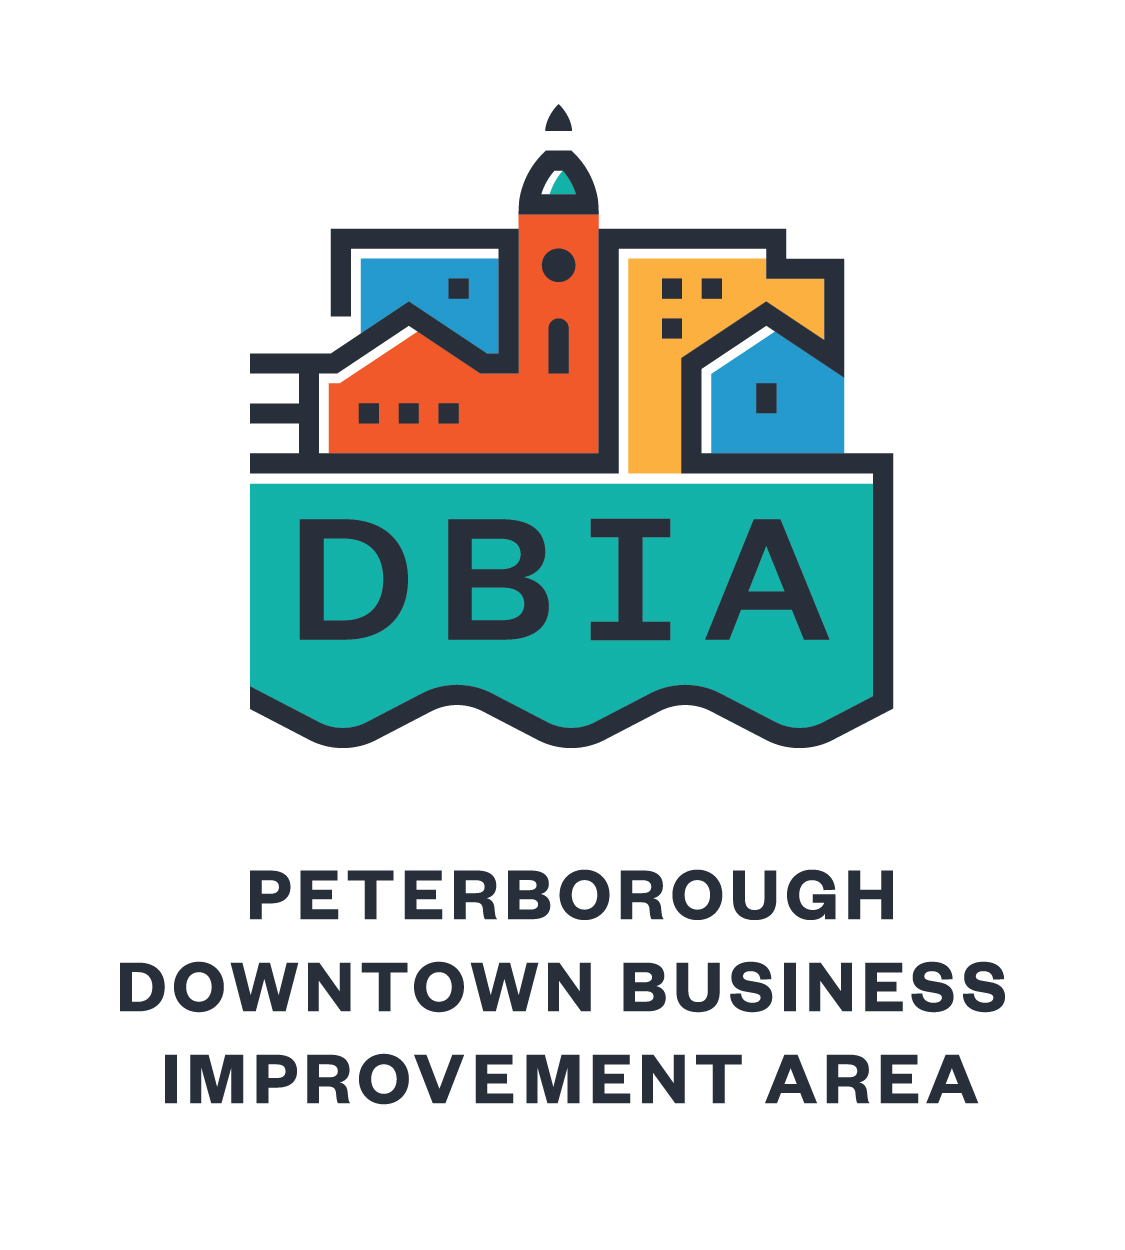 Peterborough Downtown Business Improvement Area